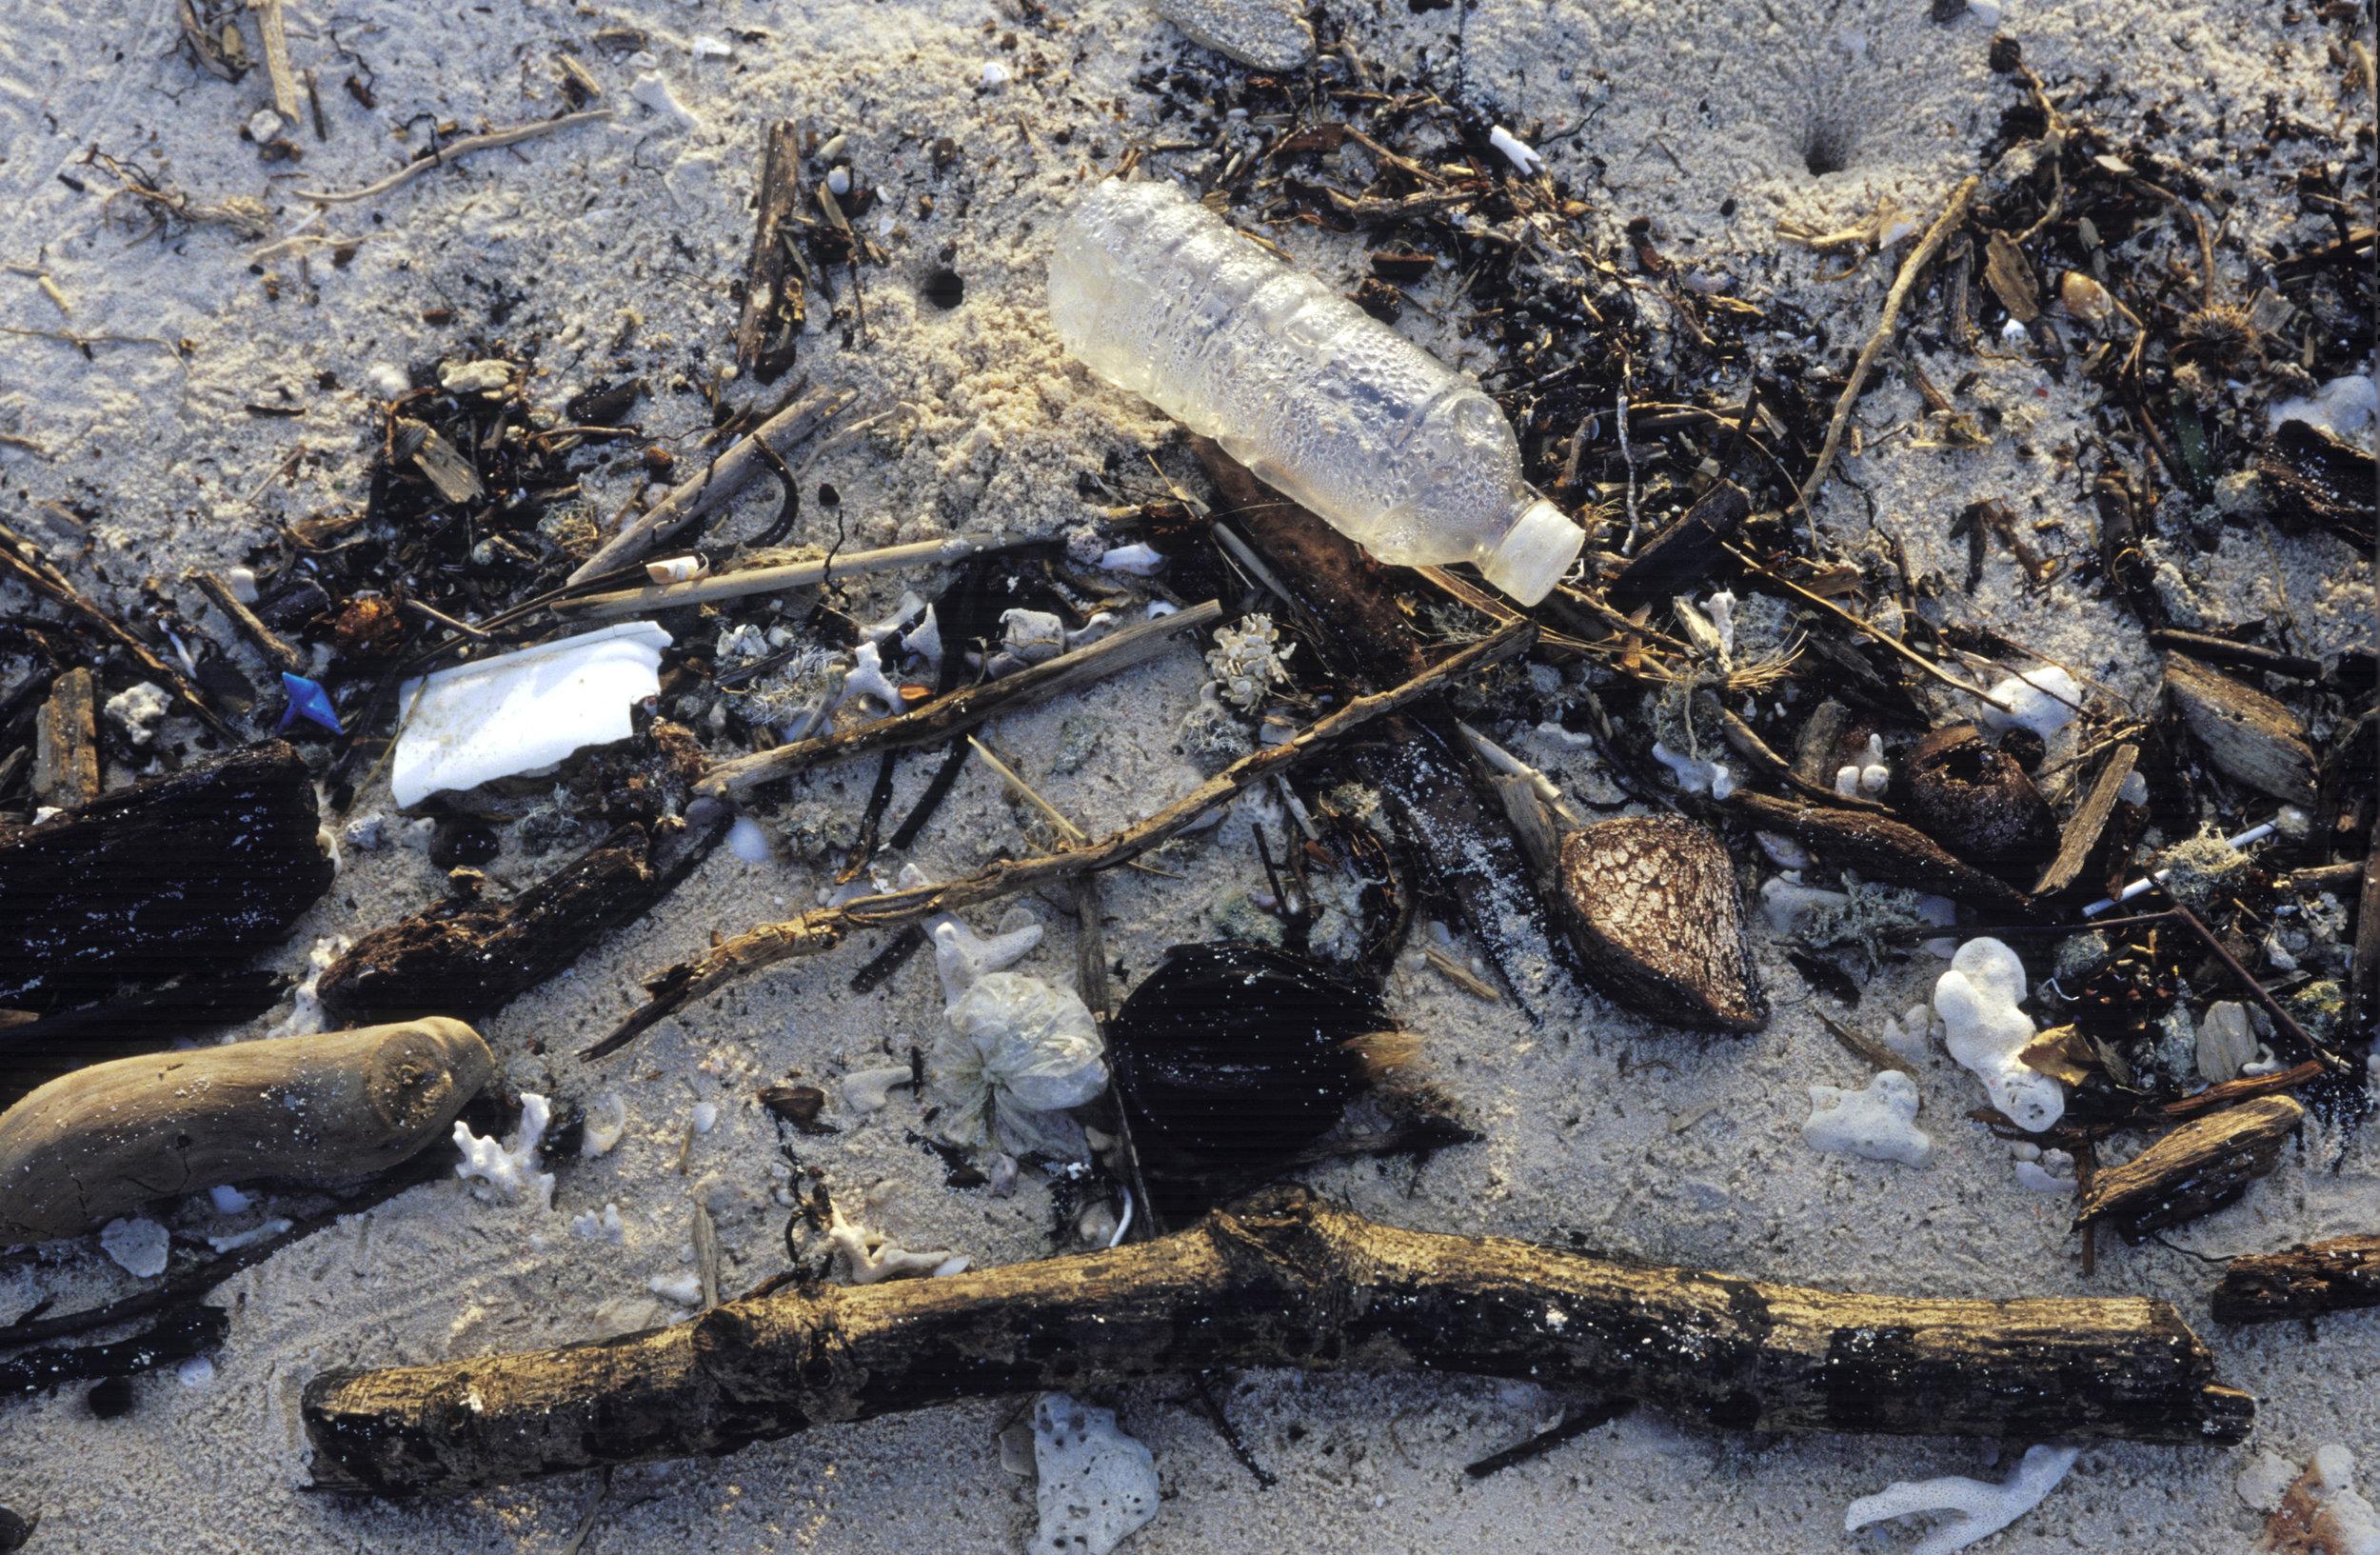 Plastic and trash wash ashore the turtle nesting beaches of Sangalaki island in the Derawan island chain off East Kalimantan, Indonesia. Photo by Mark Godfrey.